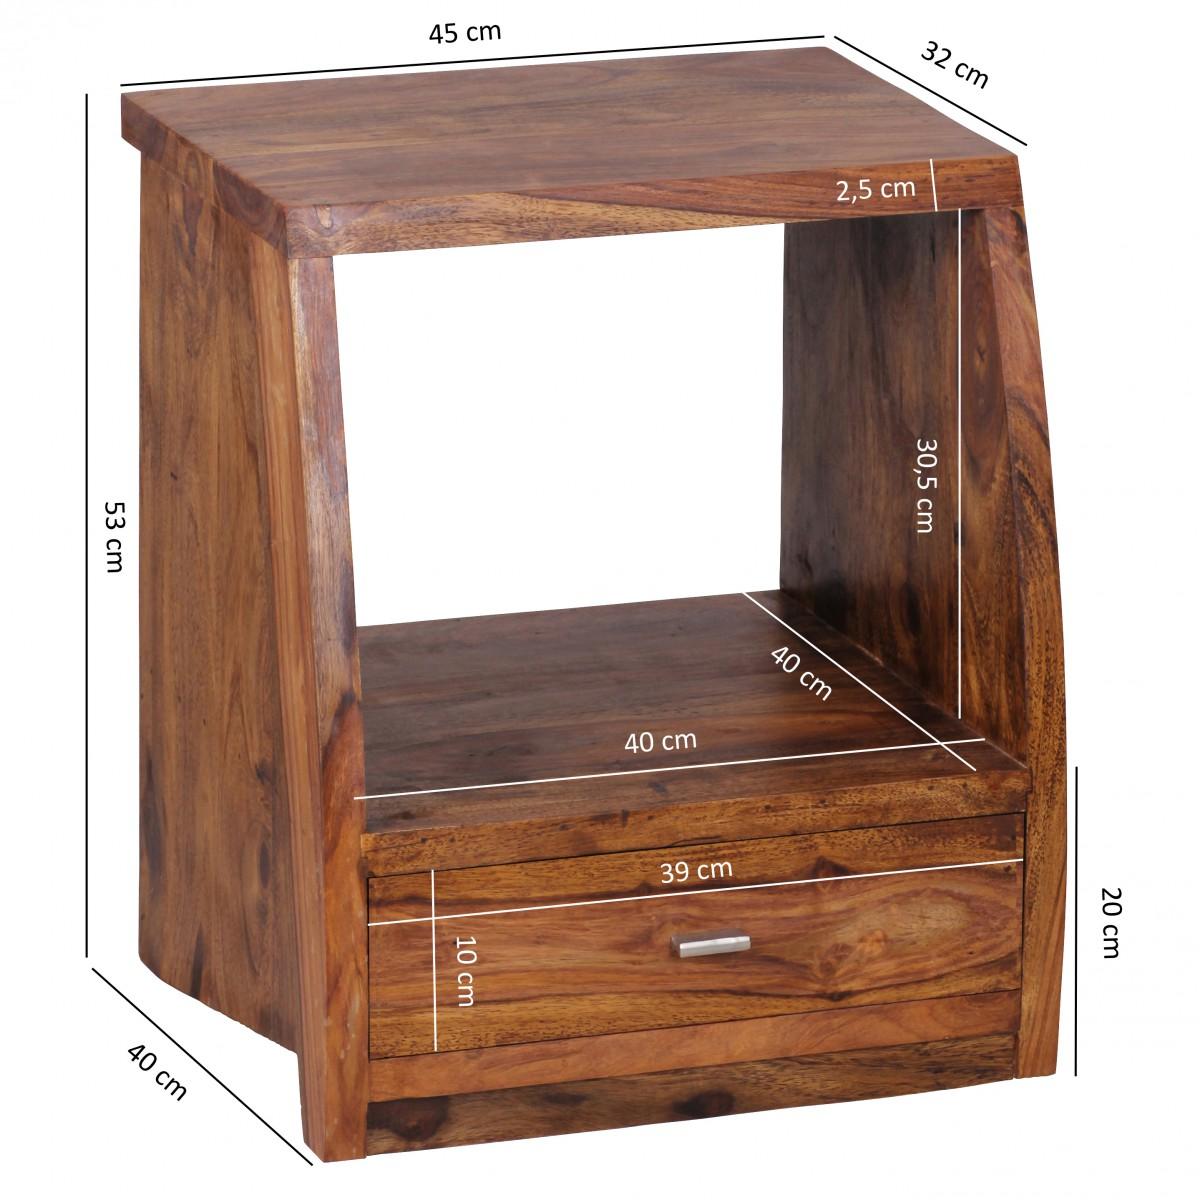 wohnling palissandre bois table de chevet 45cm avec 1 tiroir et tablette neuf. Black Bedroom Furniture Sets. Home Design Ideas